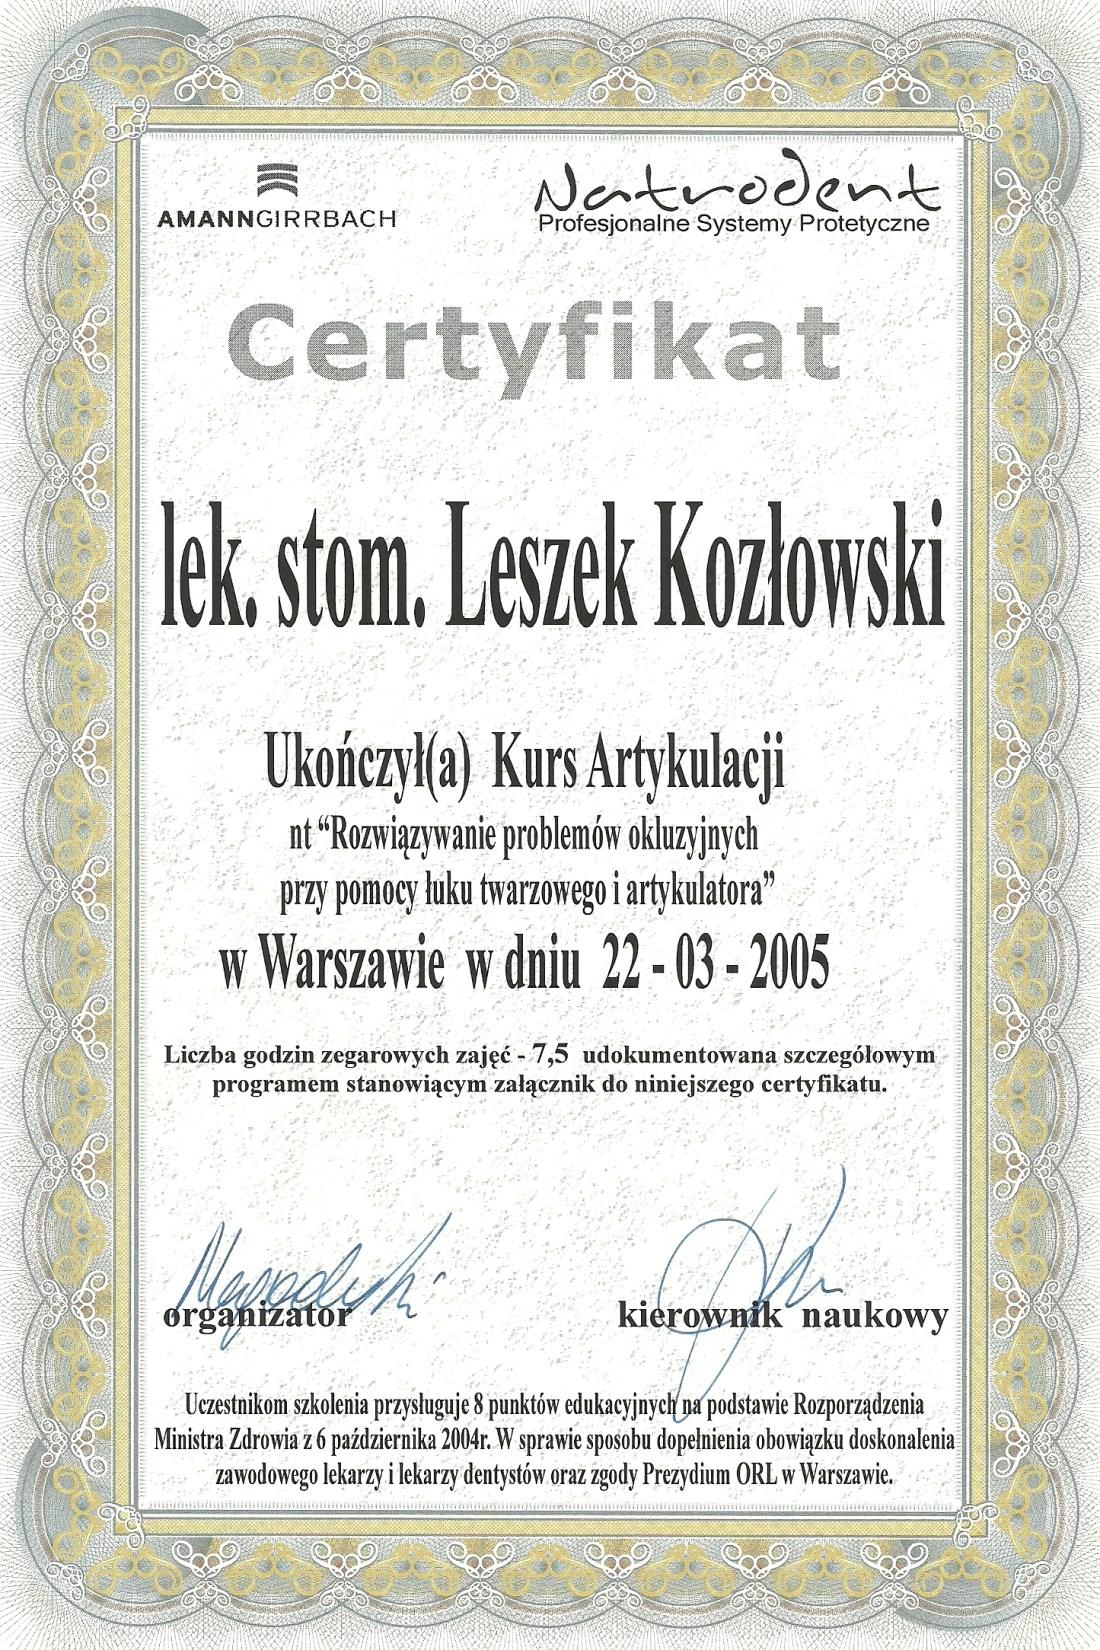 dentysta warszawa DENTYSTA WARSZAWA – DENTOKLINIKA Dentysta warszawa Leszek Kozlowski Certyfikat 8